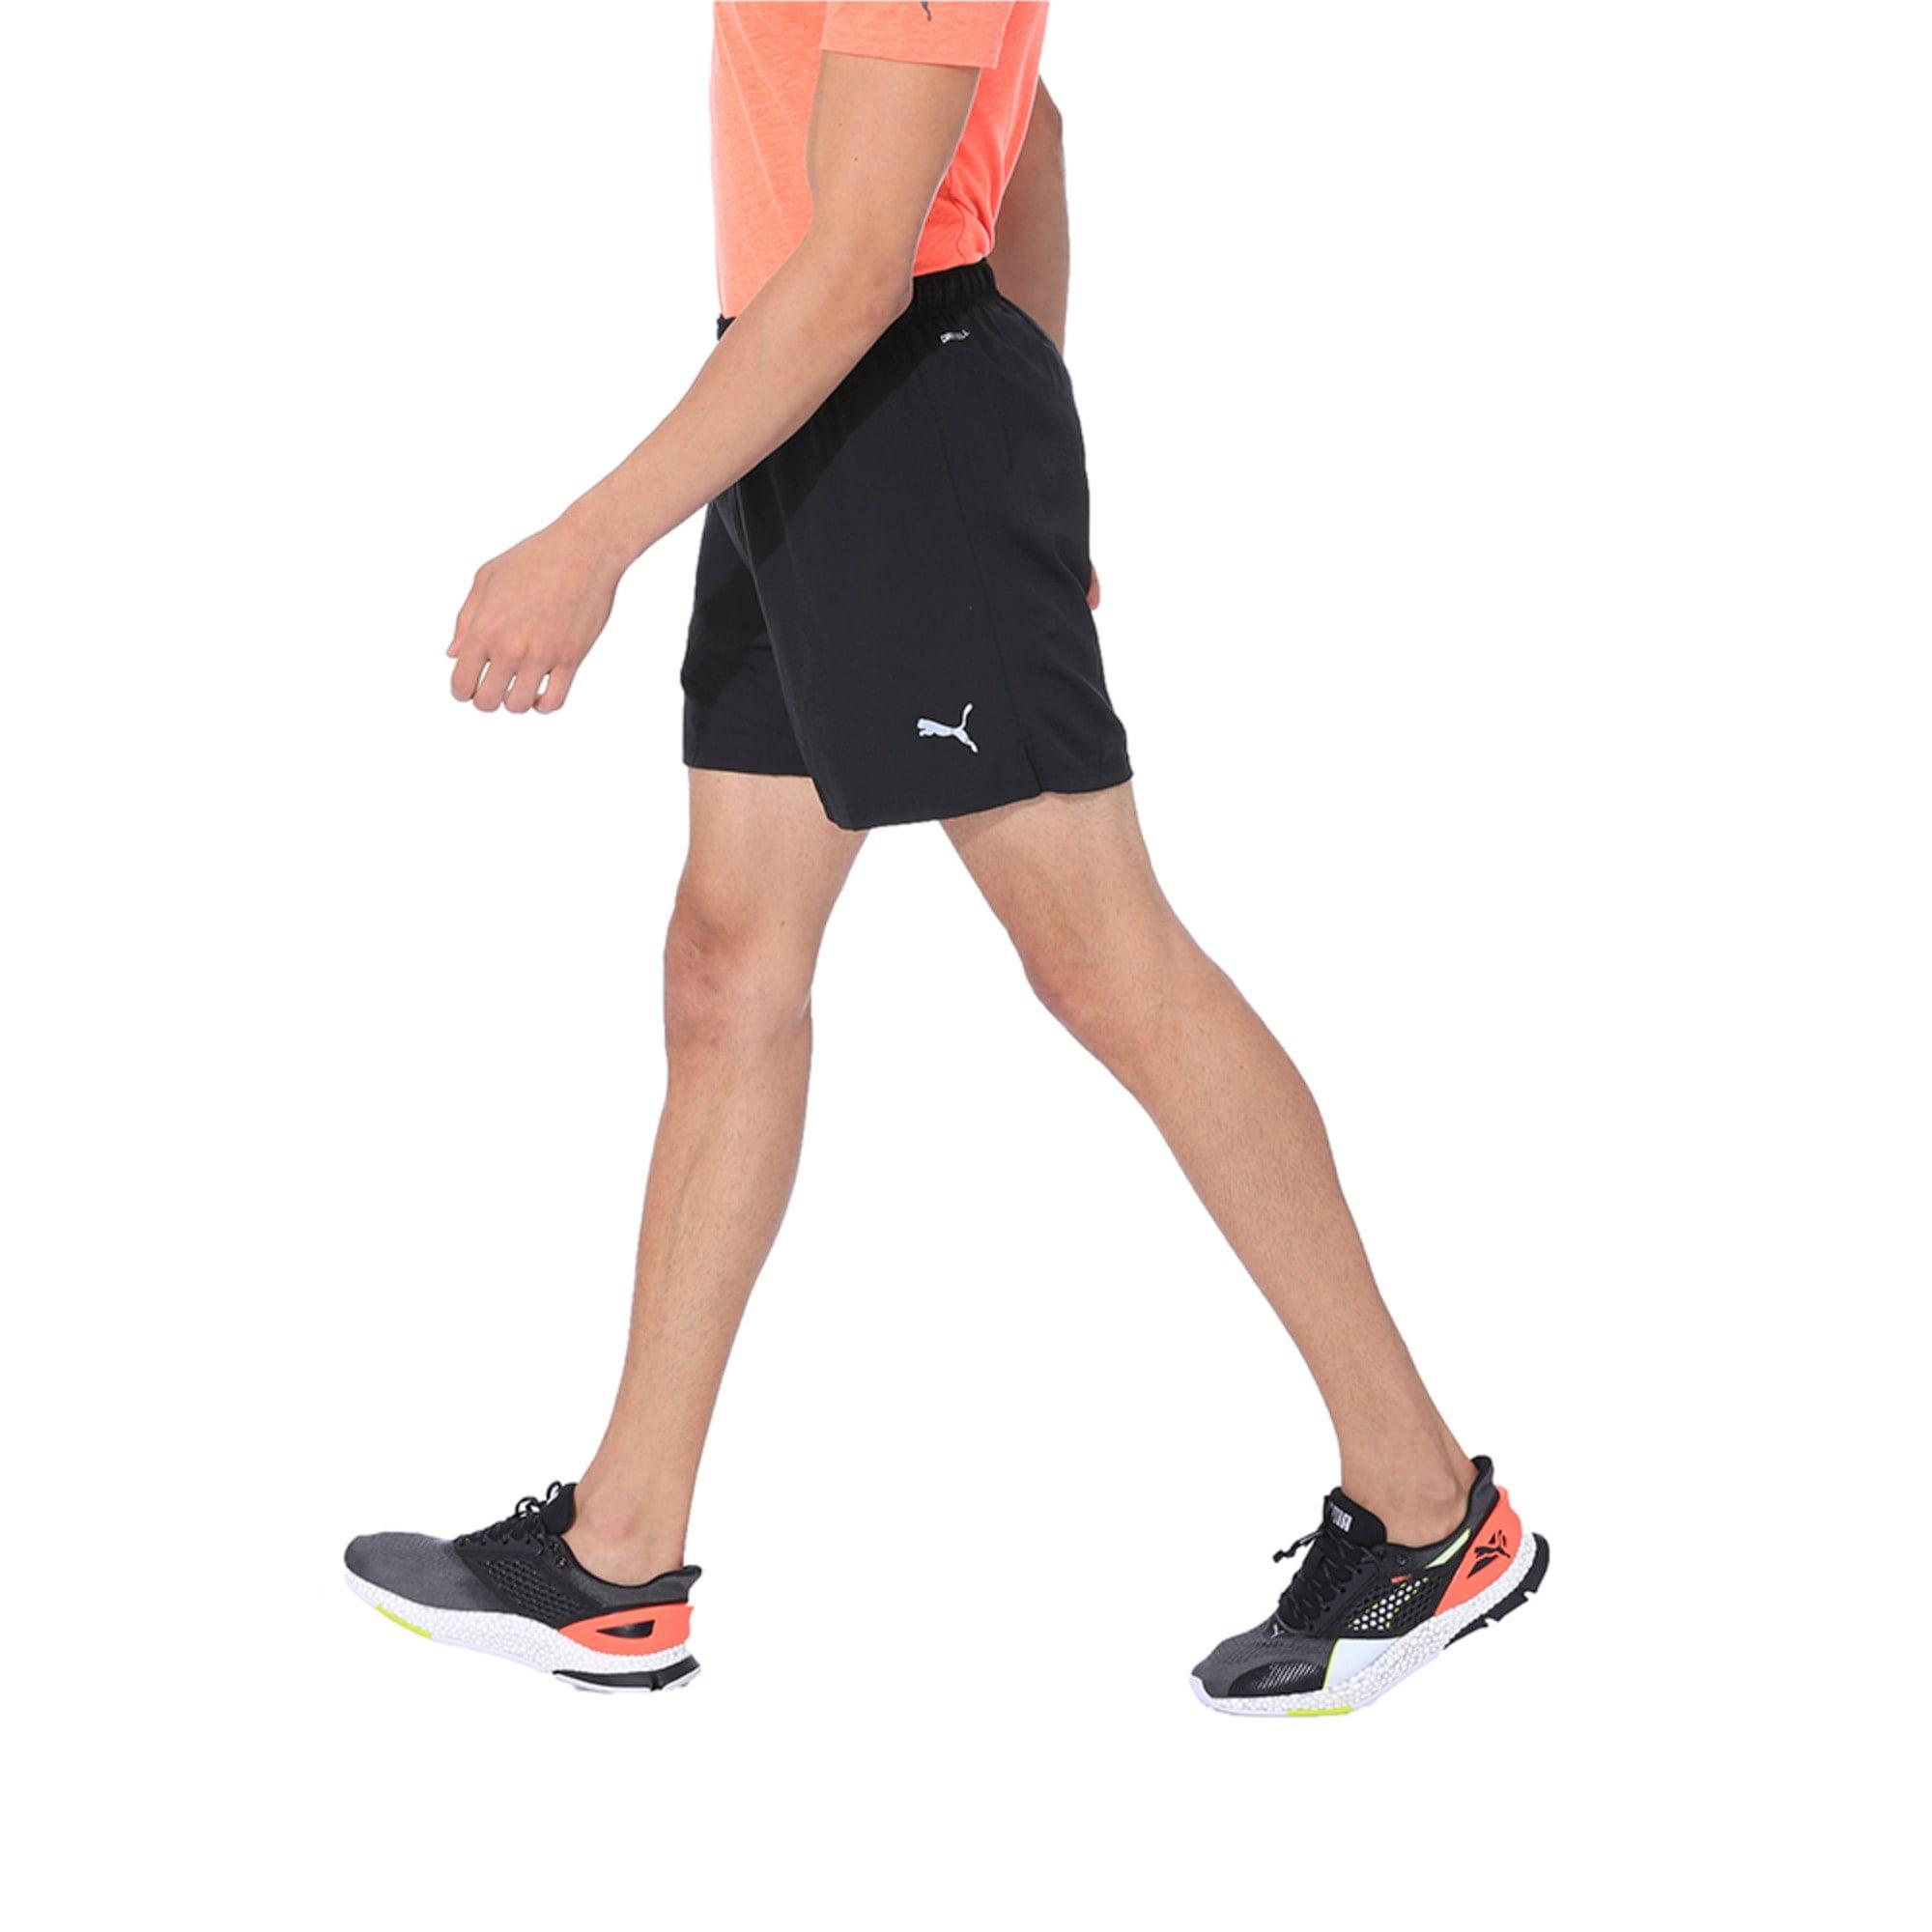 "Thumbnail 1 of ADHM 2019 IGNITE 5"" Men's Running Shorts, Puma Black, medium-IND"